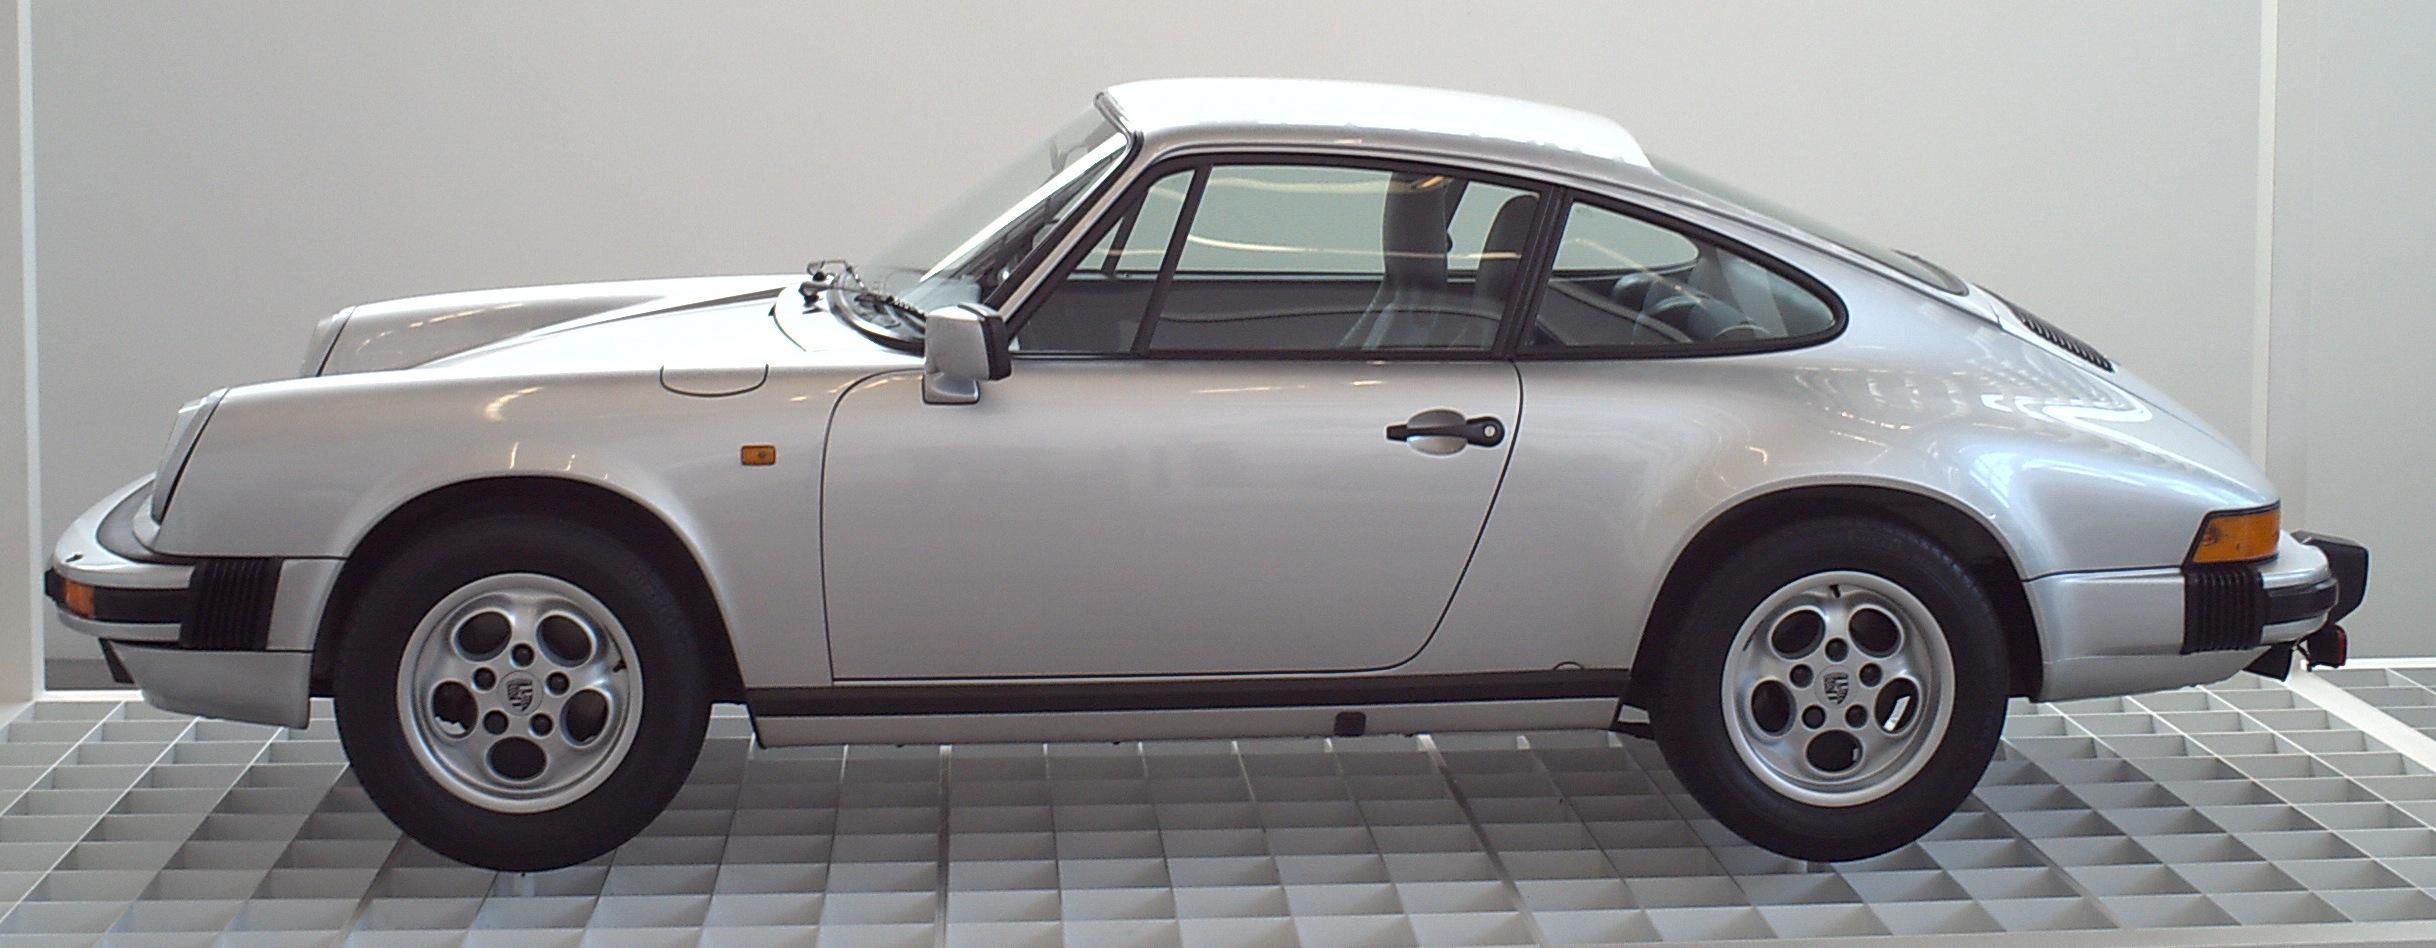 Porsche  Sc Paint Chiffon White Coek